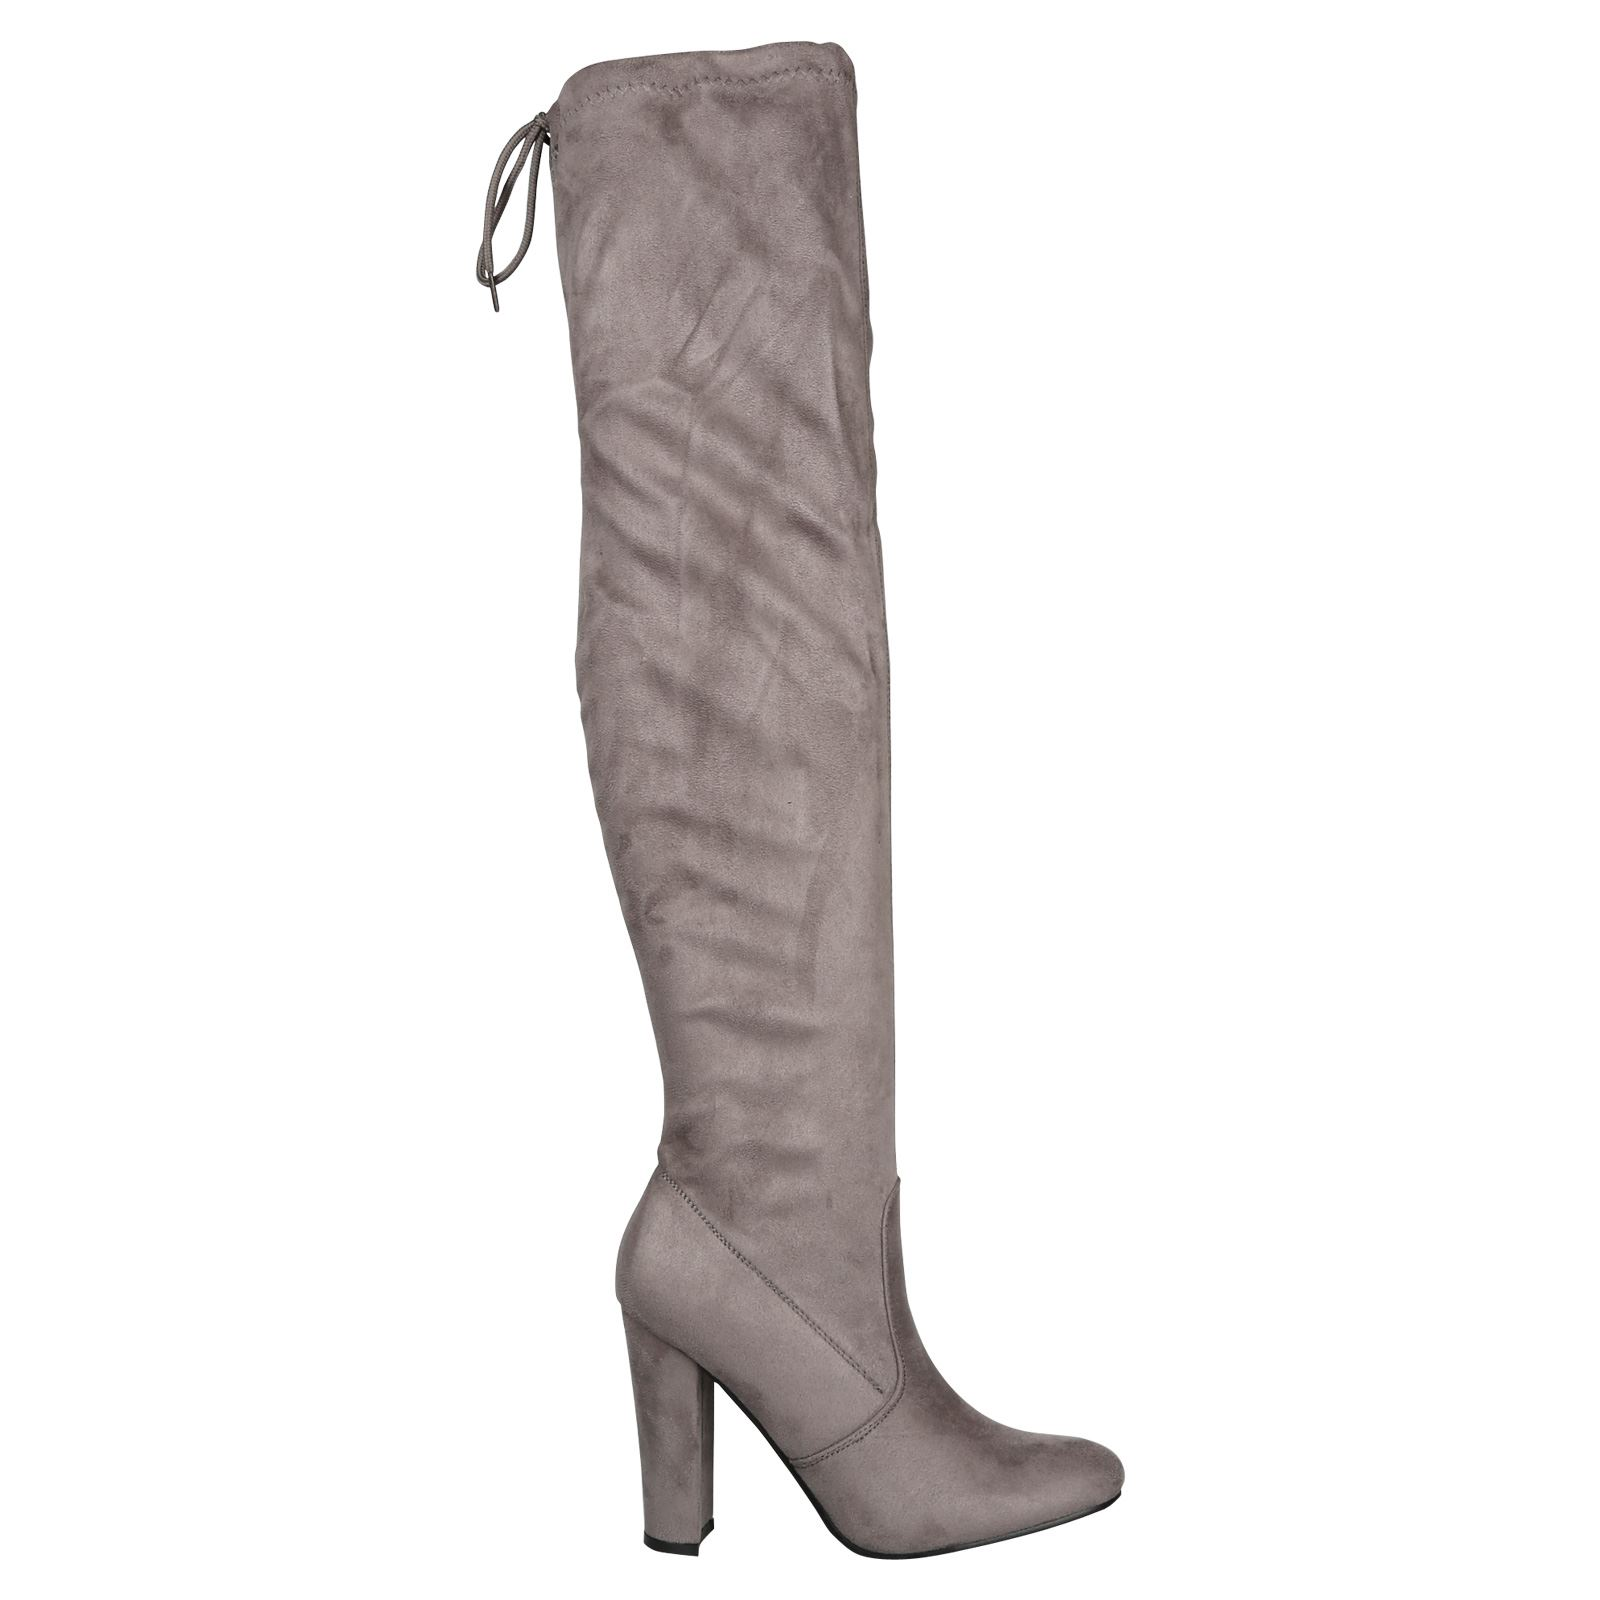 Iliana-Womens-Knee-High-Zip-Up-Adjustable-Pull-Strings-Mid-High-Block-Heel-Boots thumbnail 11